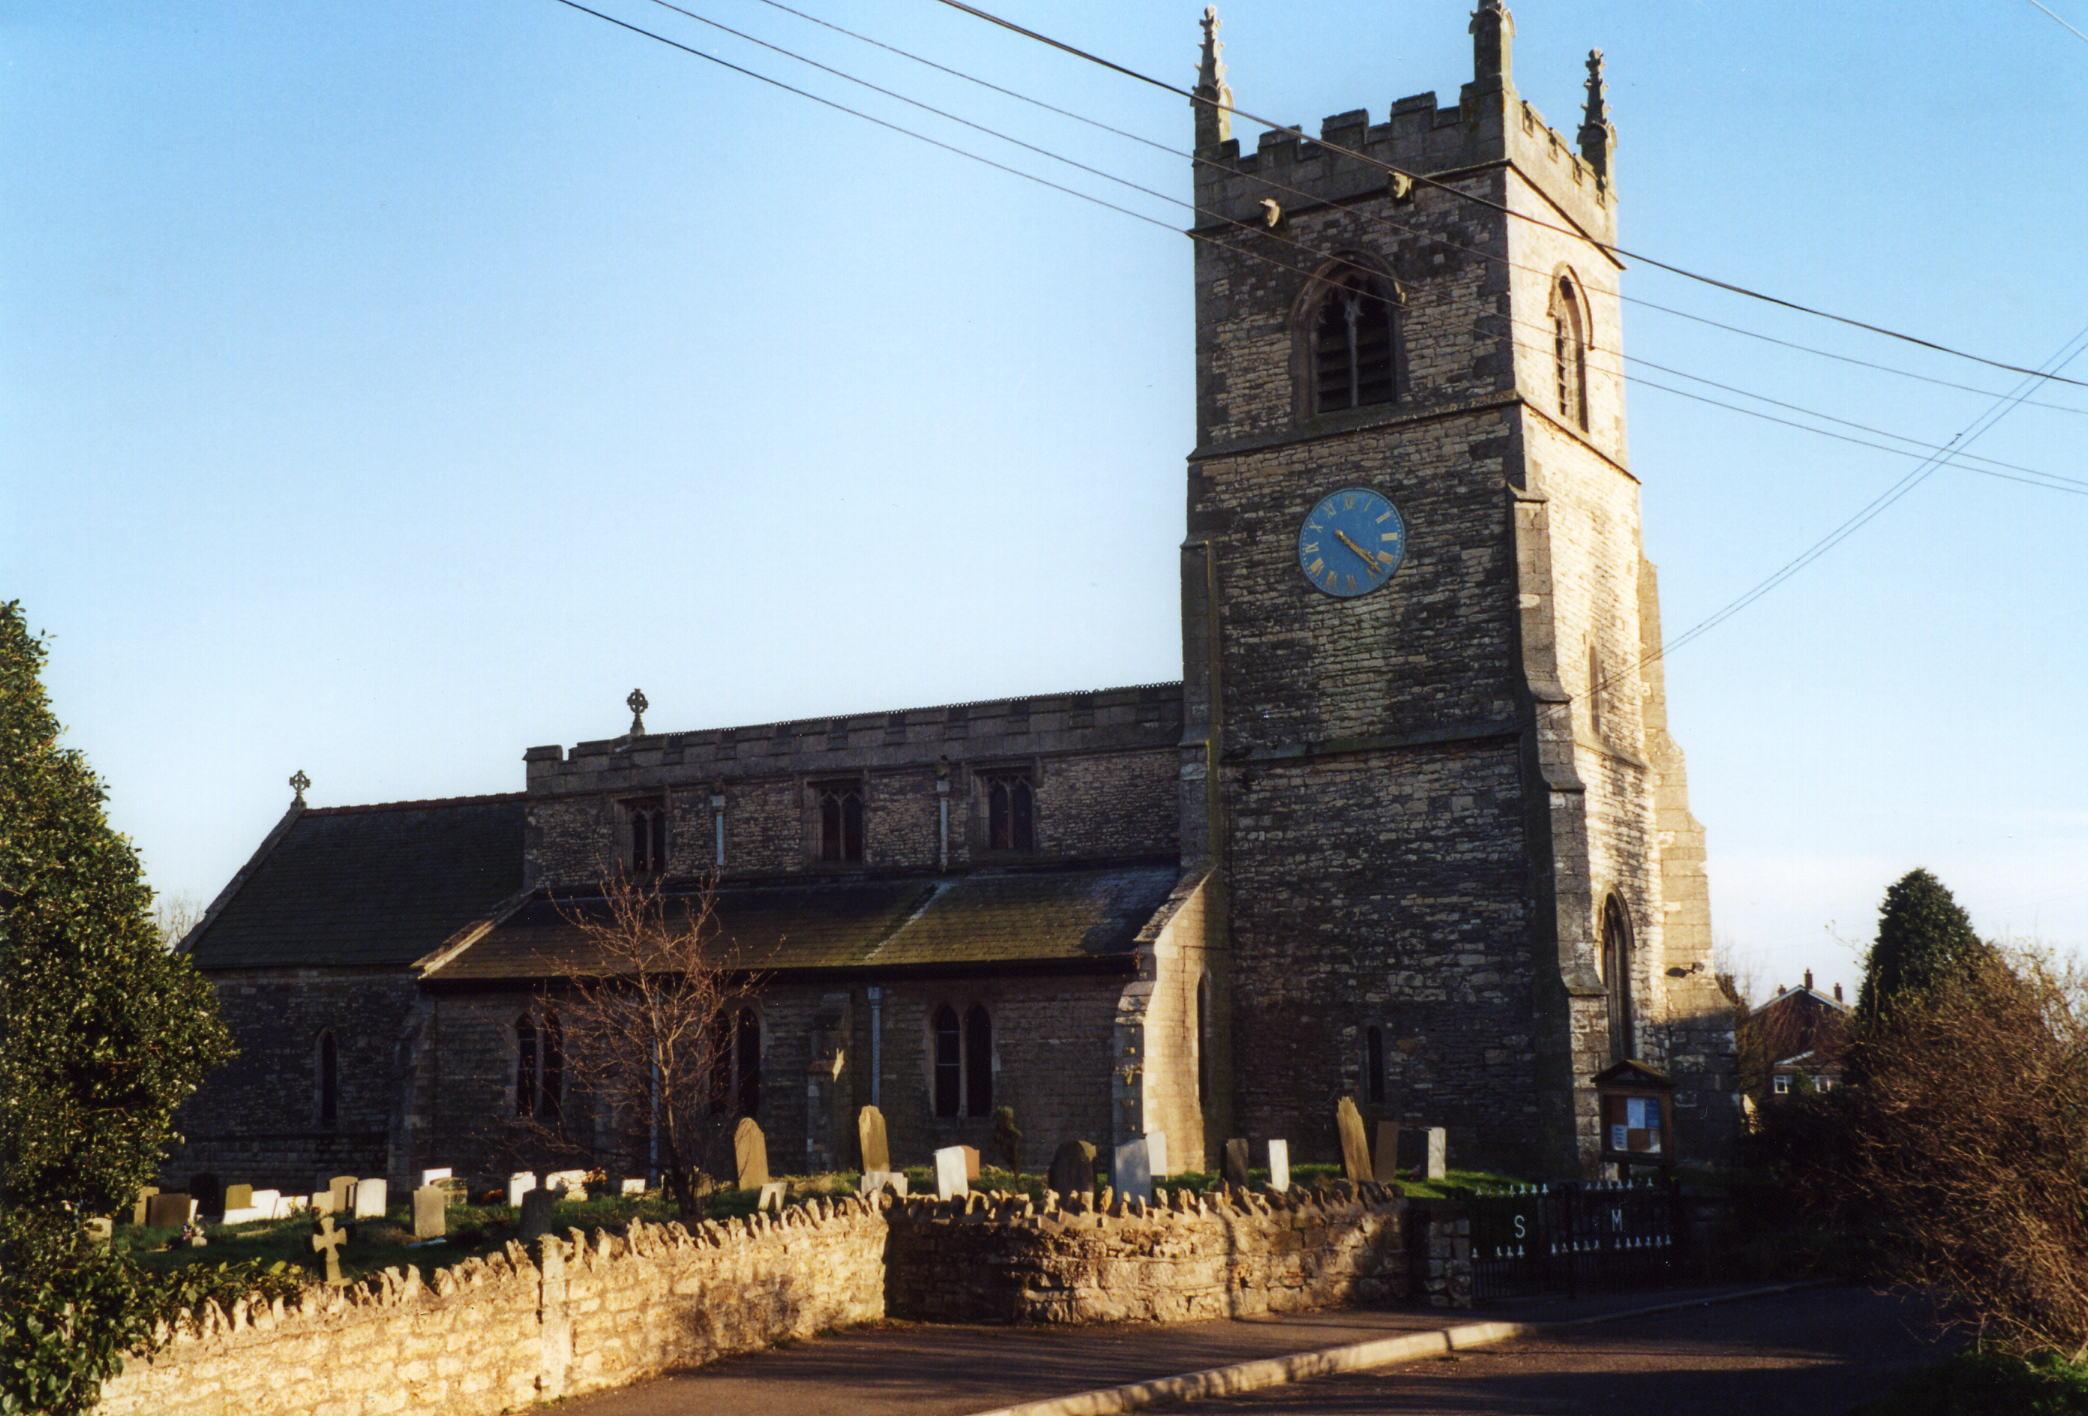 Blyton St. Martin parish church